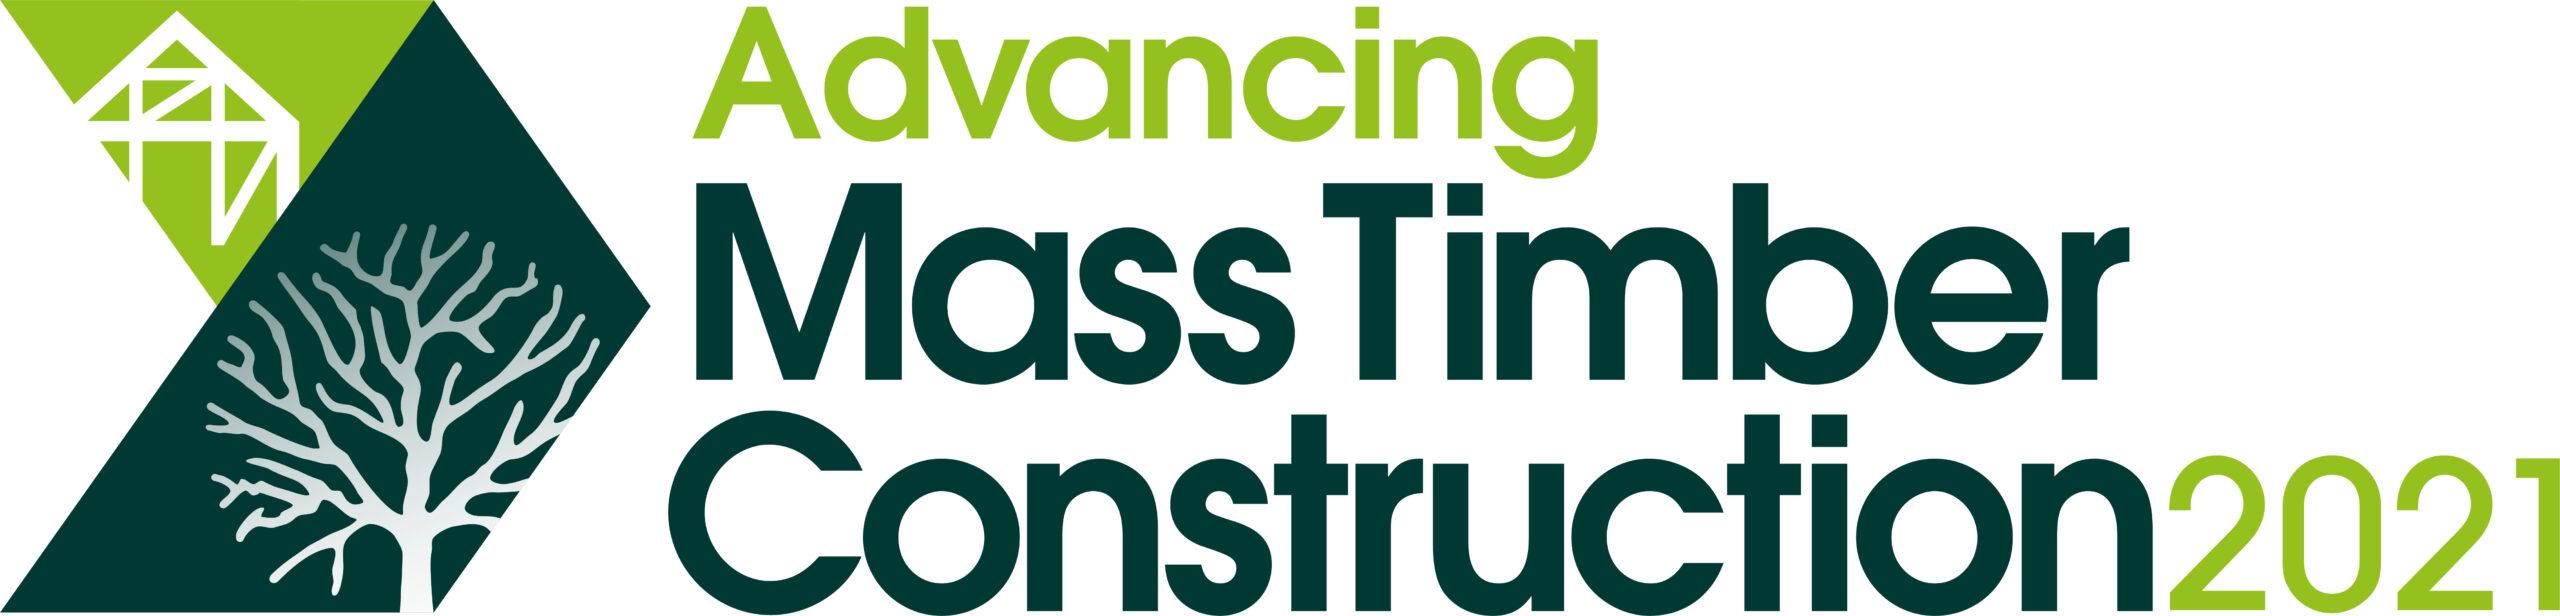 HW200122 Advancing Mass Timber Construction 2021 logo